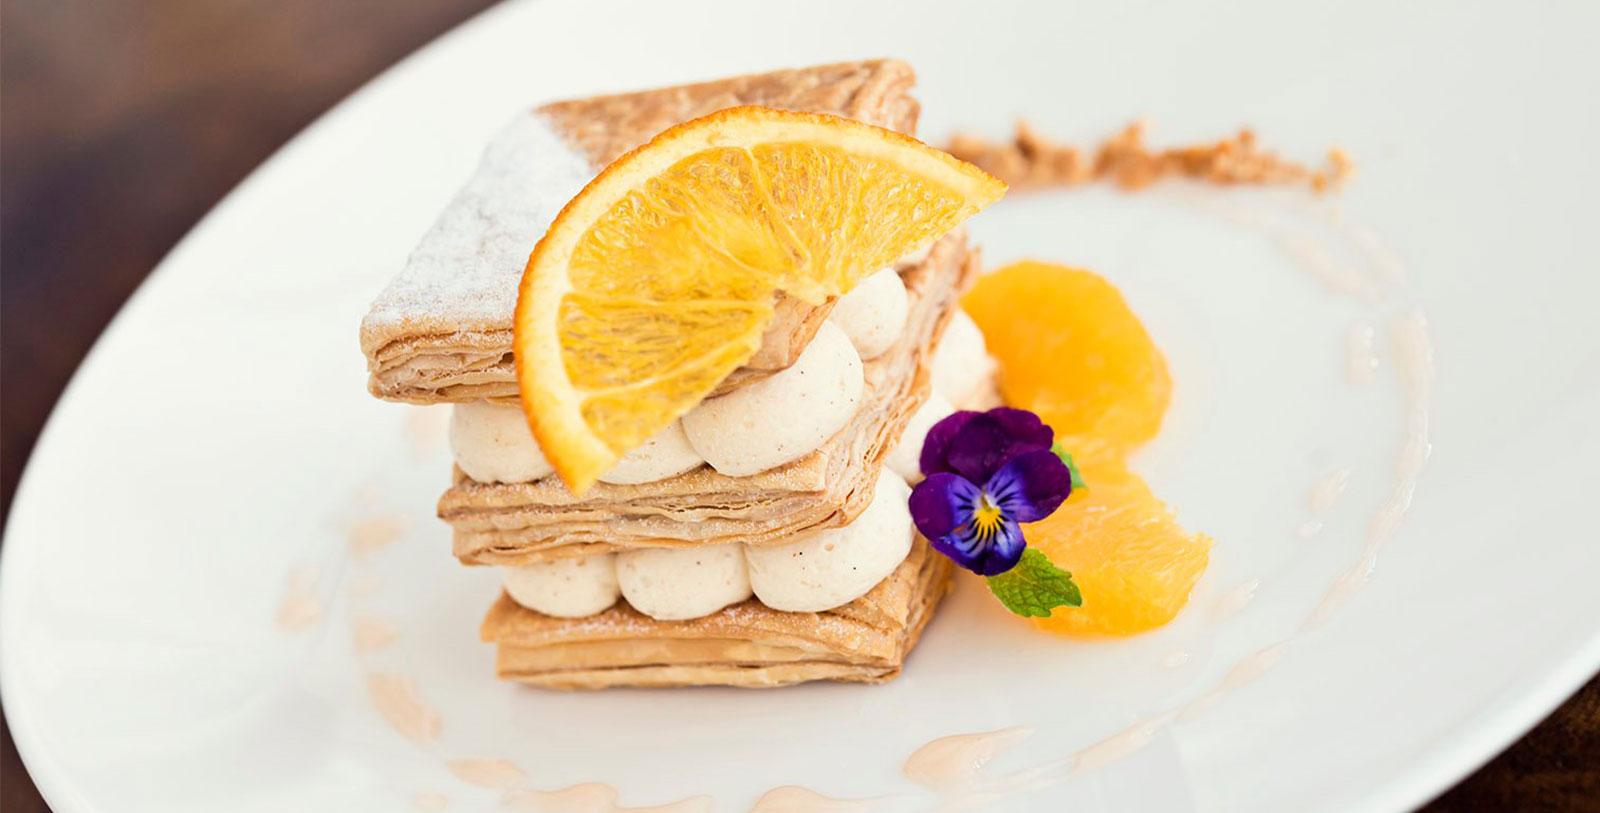 Image of Hazelnut pastry The Jefferson Hotel, 1895, Member of Historic Hotels of America, in Richmond, Virginia, Taste